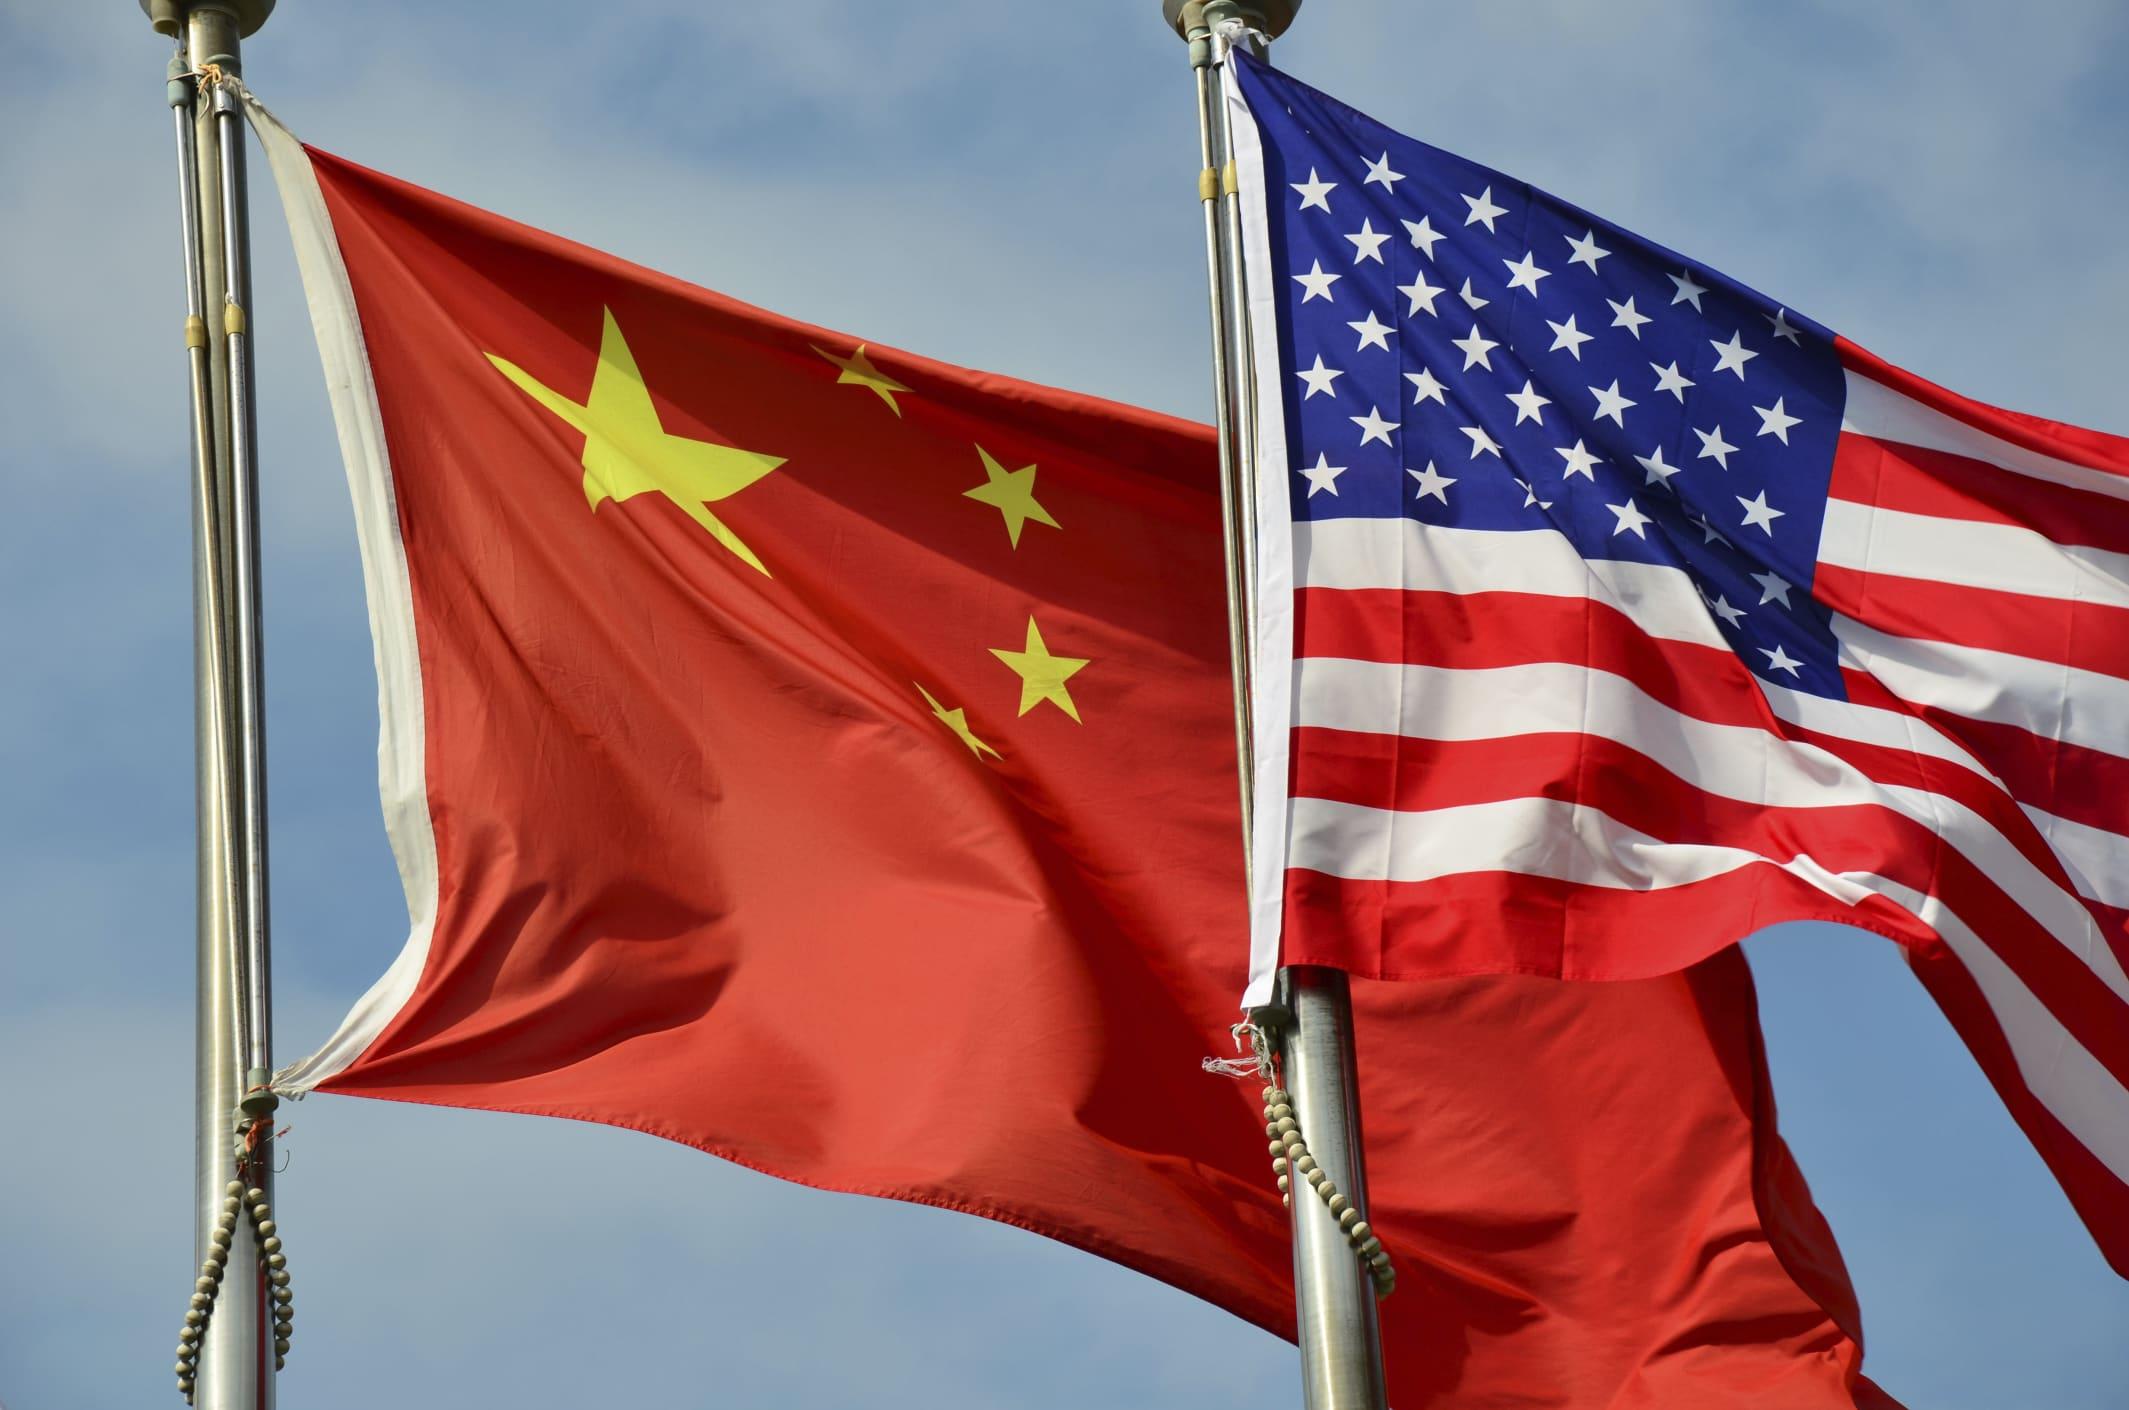 AS dan China mungkin mampu menerima kawasan yang disukai untuk kerja sama dalam bencana yang meningkat di Myanmar thumbnail